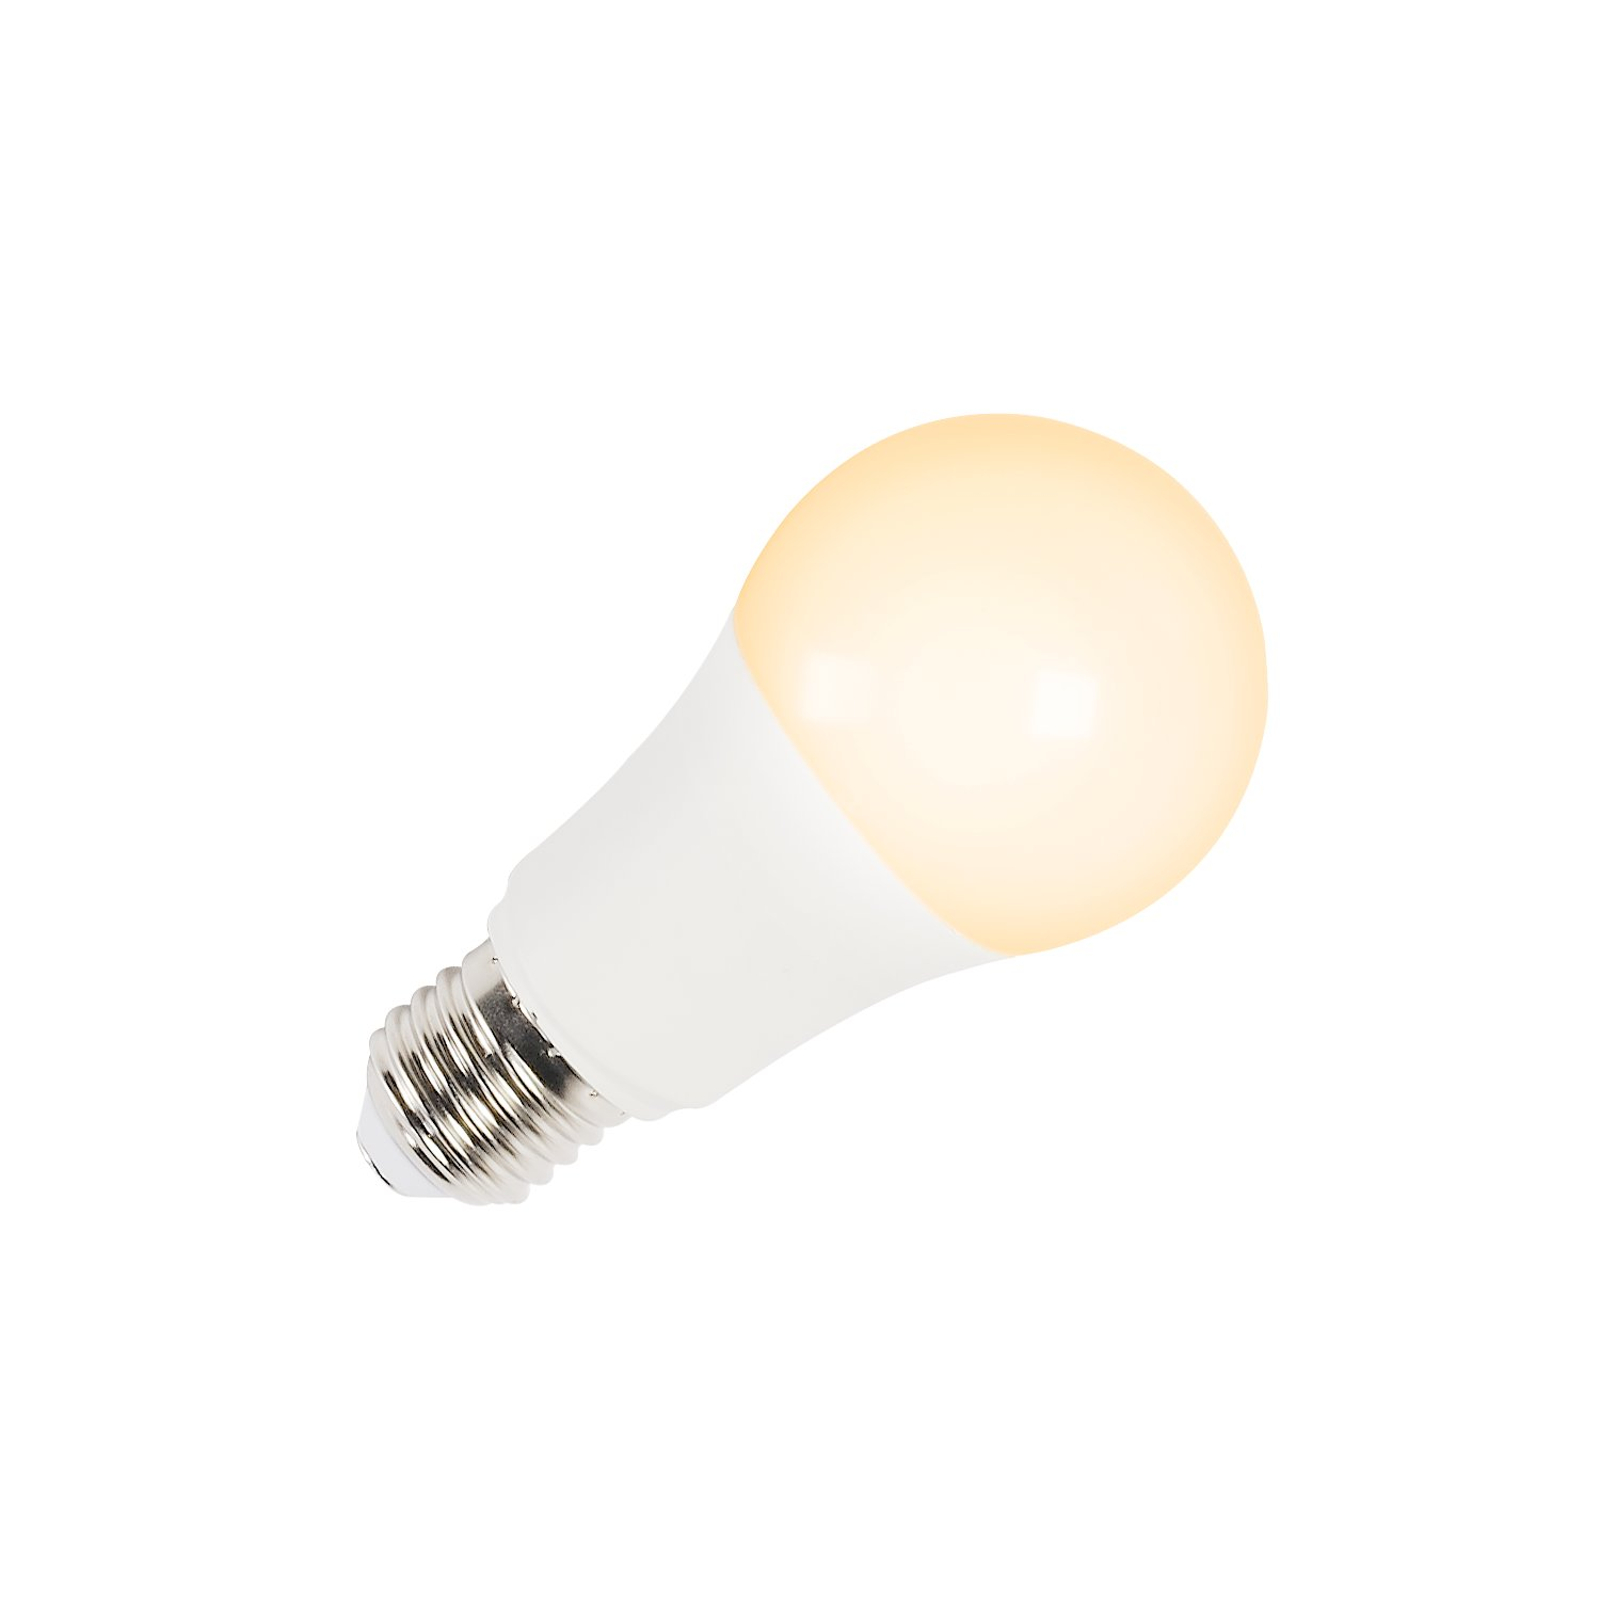 SLV VALETO LED-pære E27 A60 9W 2700-6500K 806lm